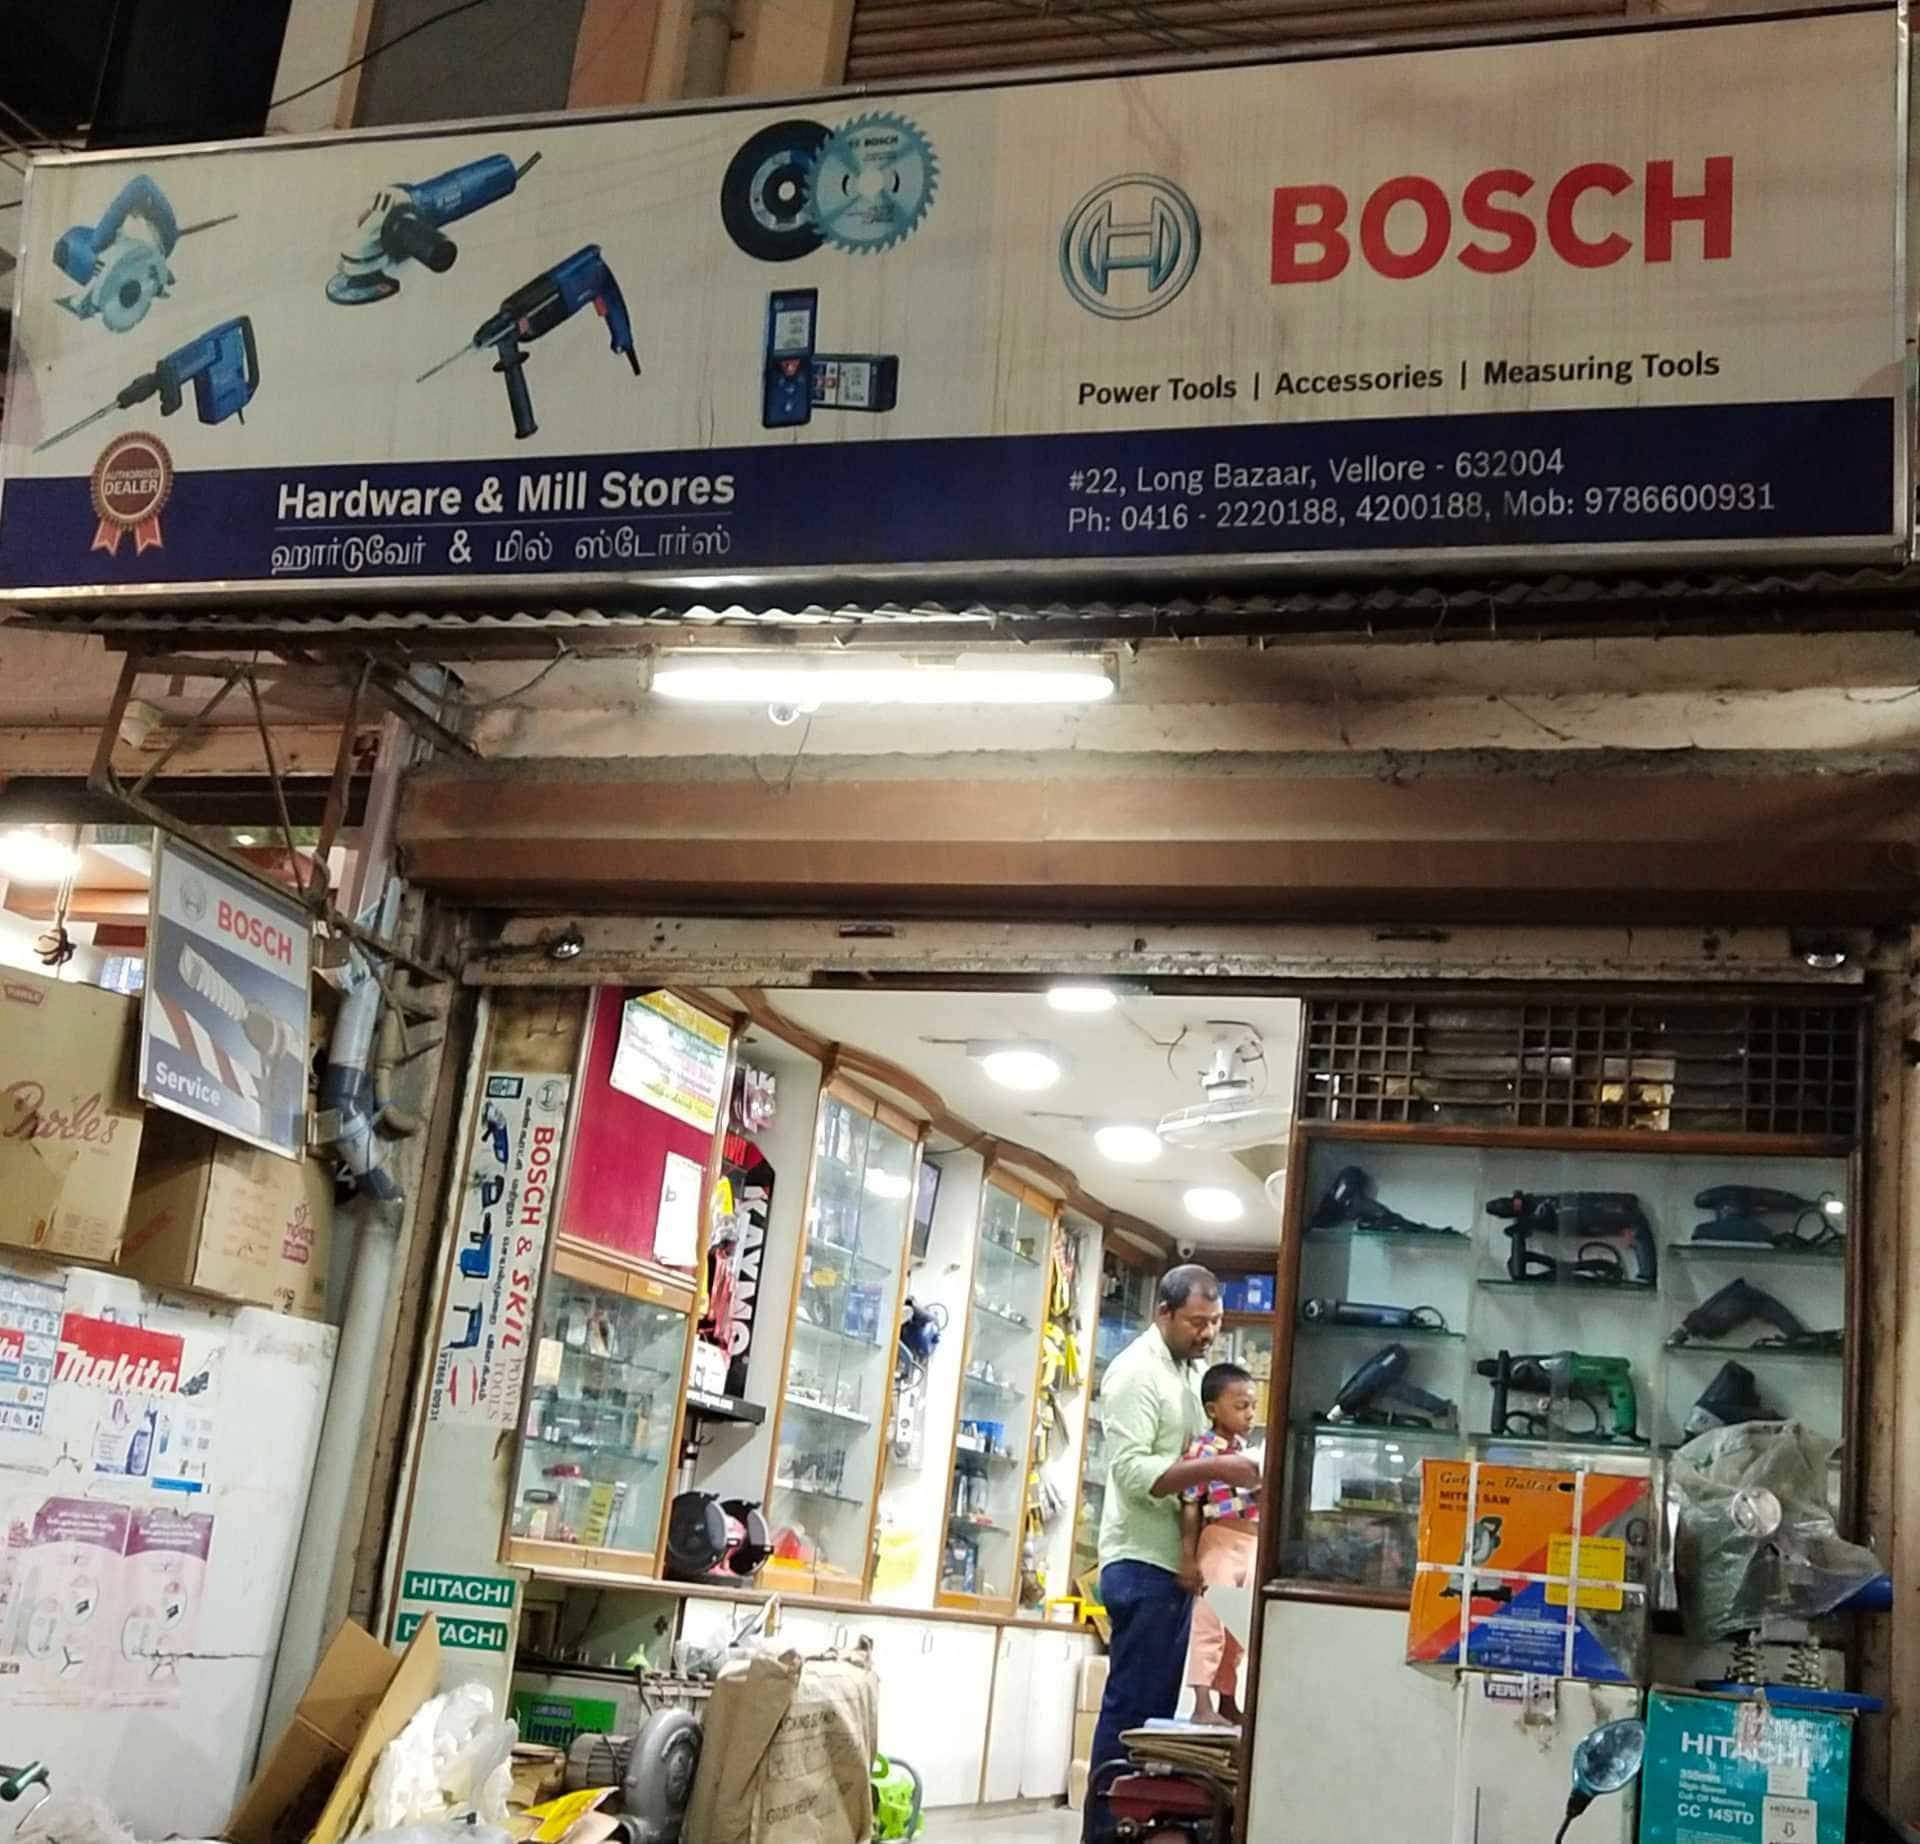 Top 50 Hardware Shops in Katpadi - Best Hardware Stores Vellore